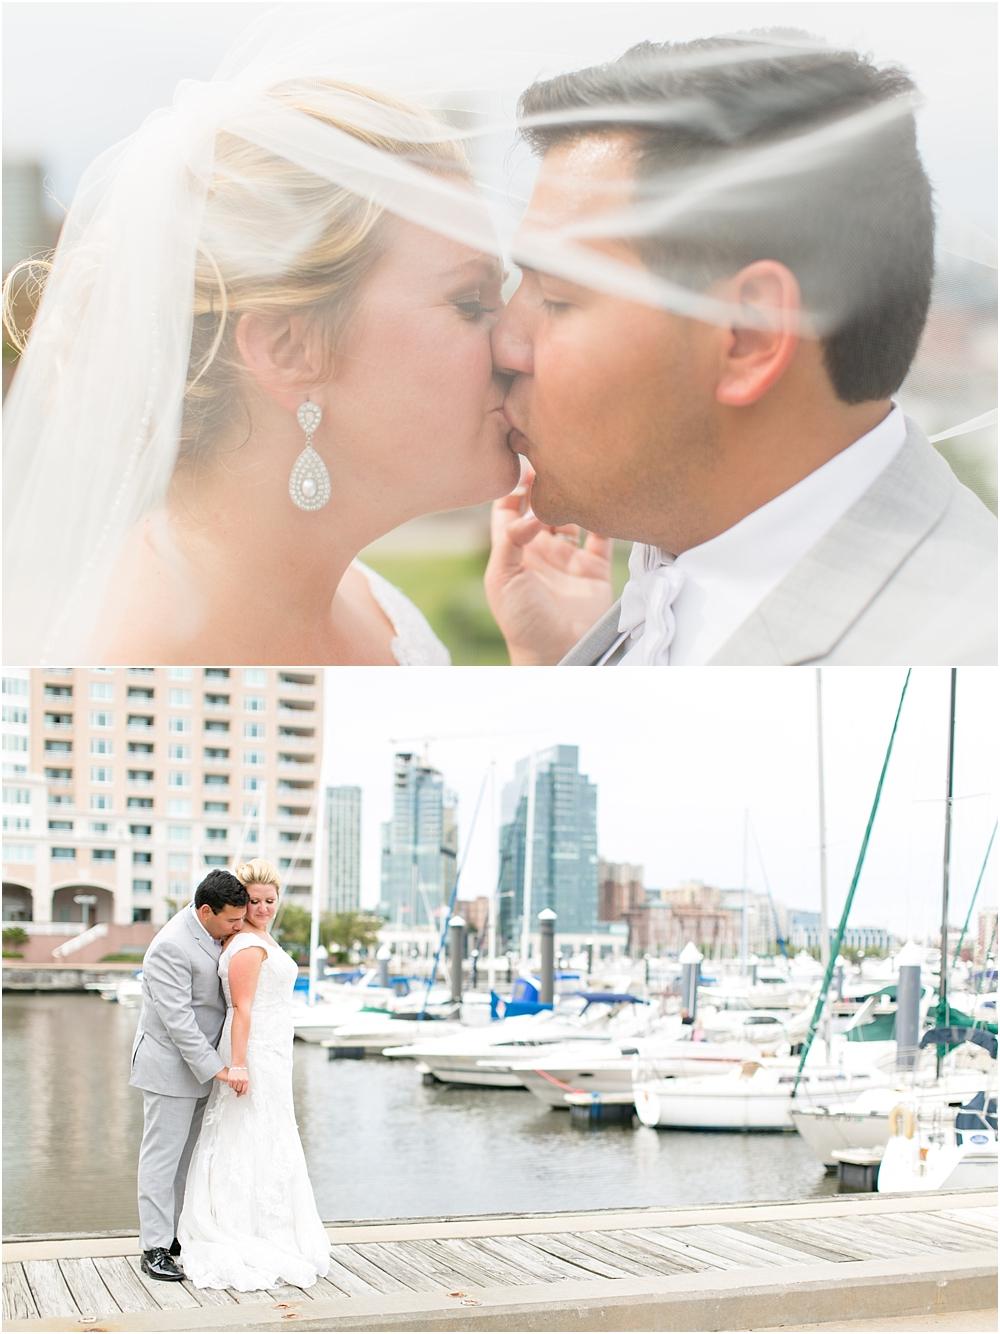 hidalgo wedding tabrizis waterfront weddings living radiant photography photos_0065.jpg